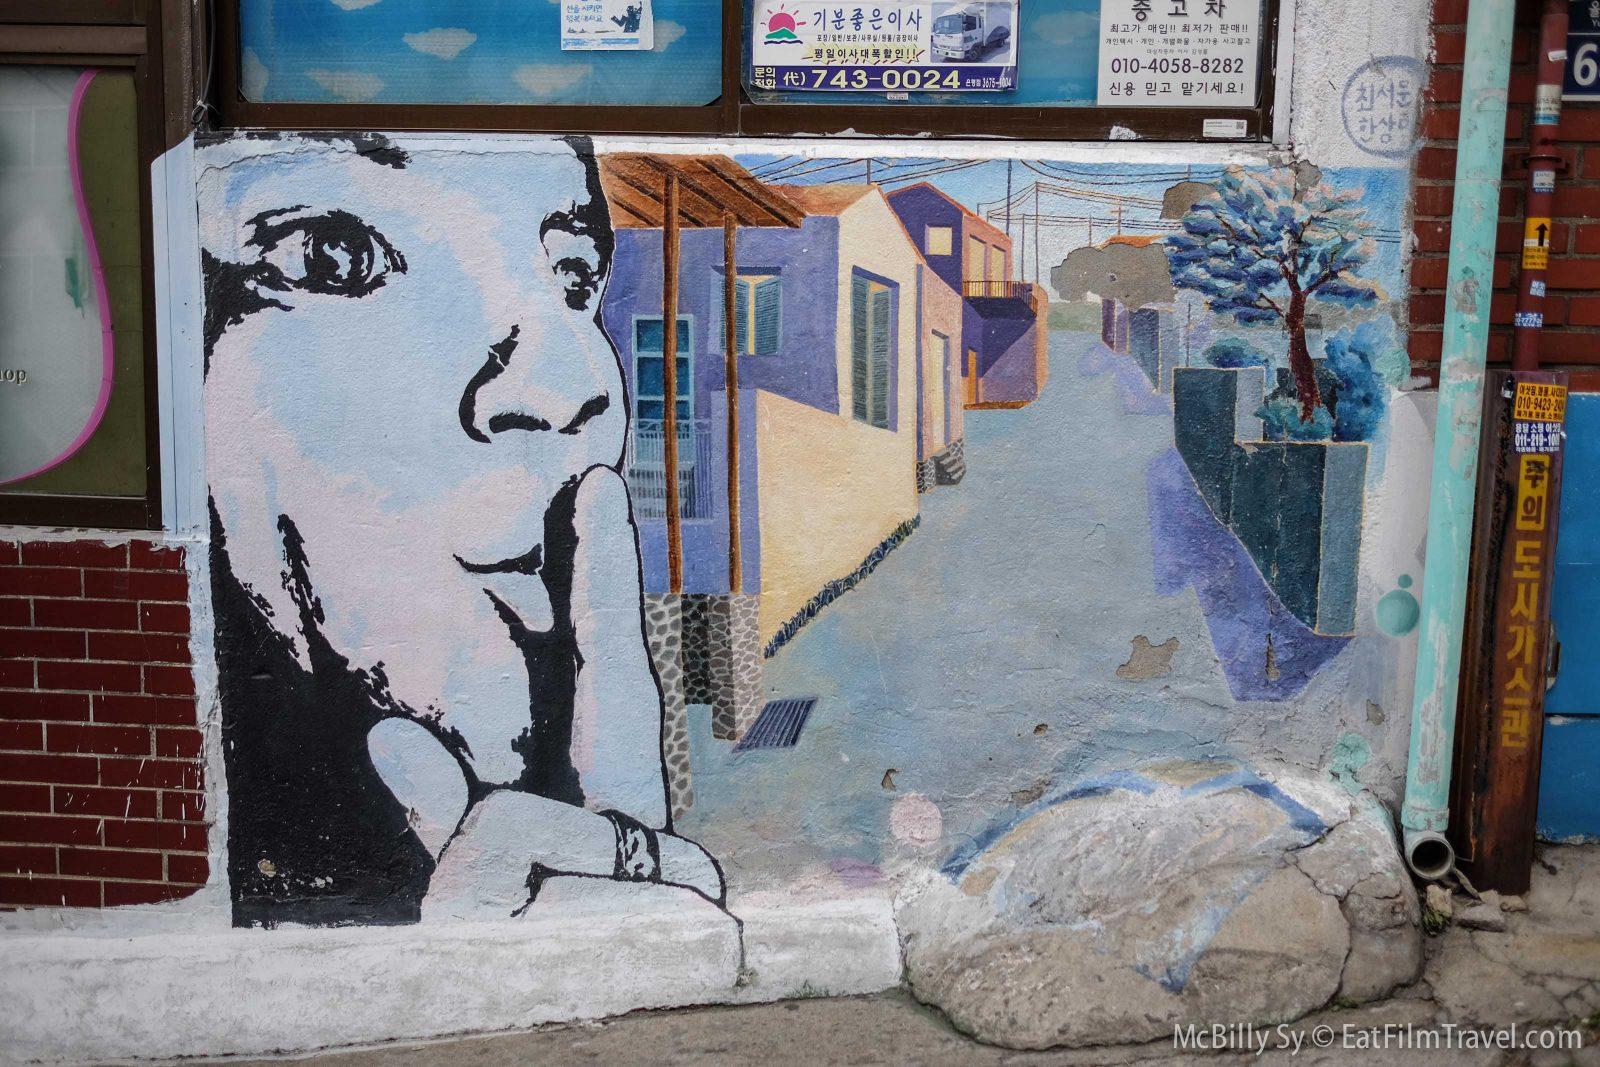 Cool art in Ihwa Mural Village